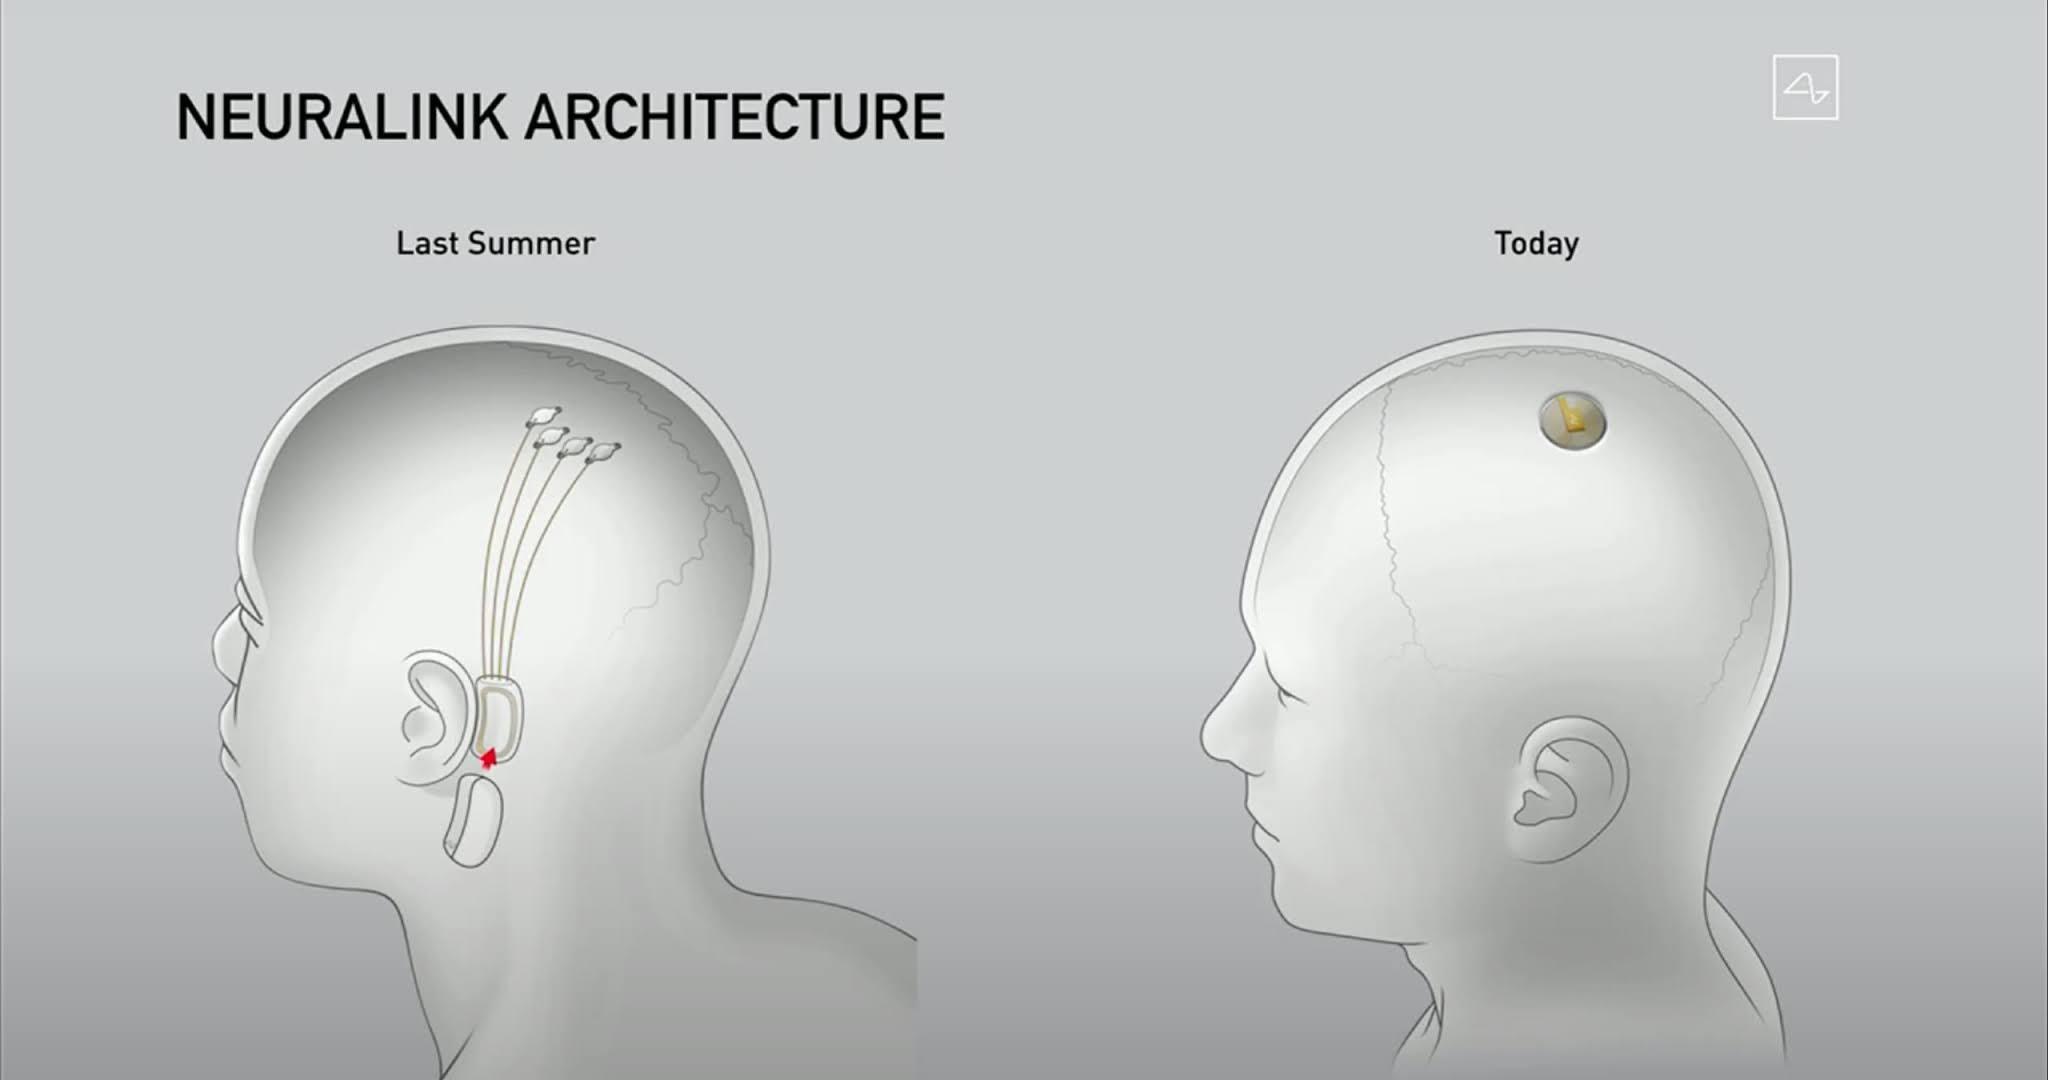 implante neuralink